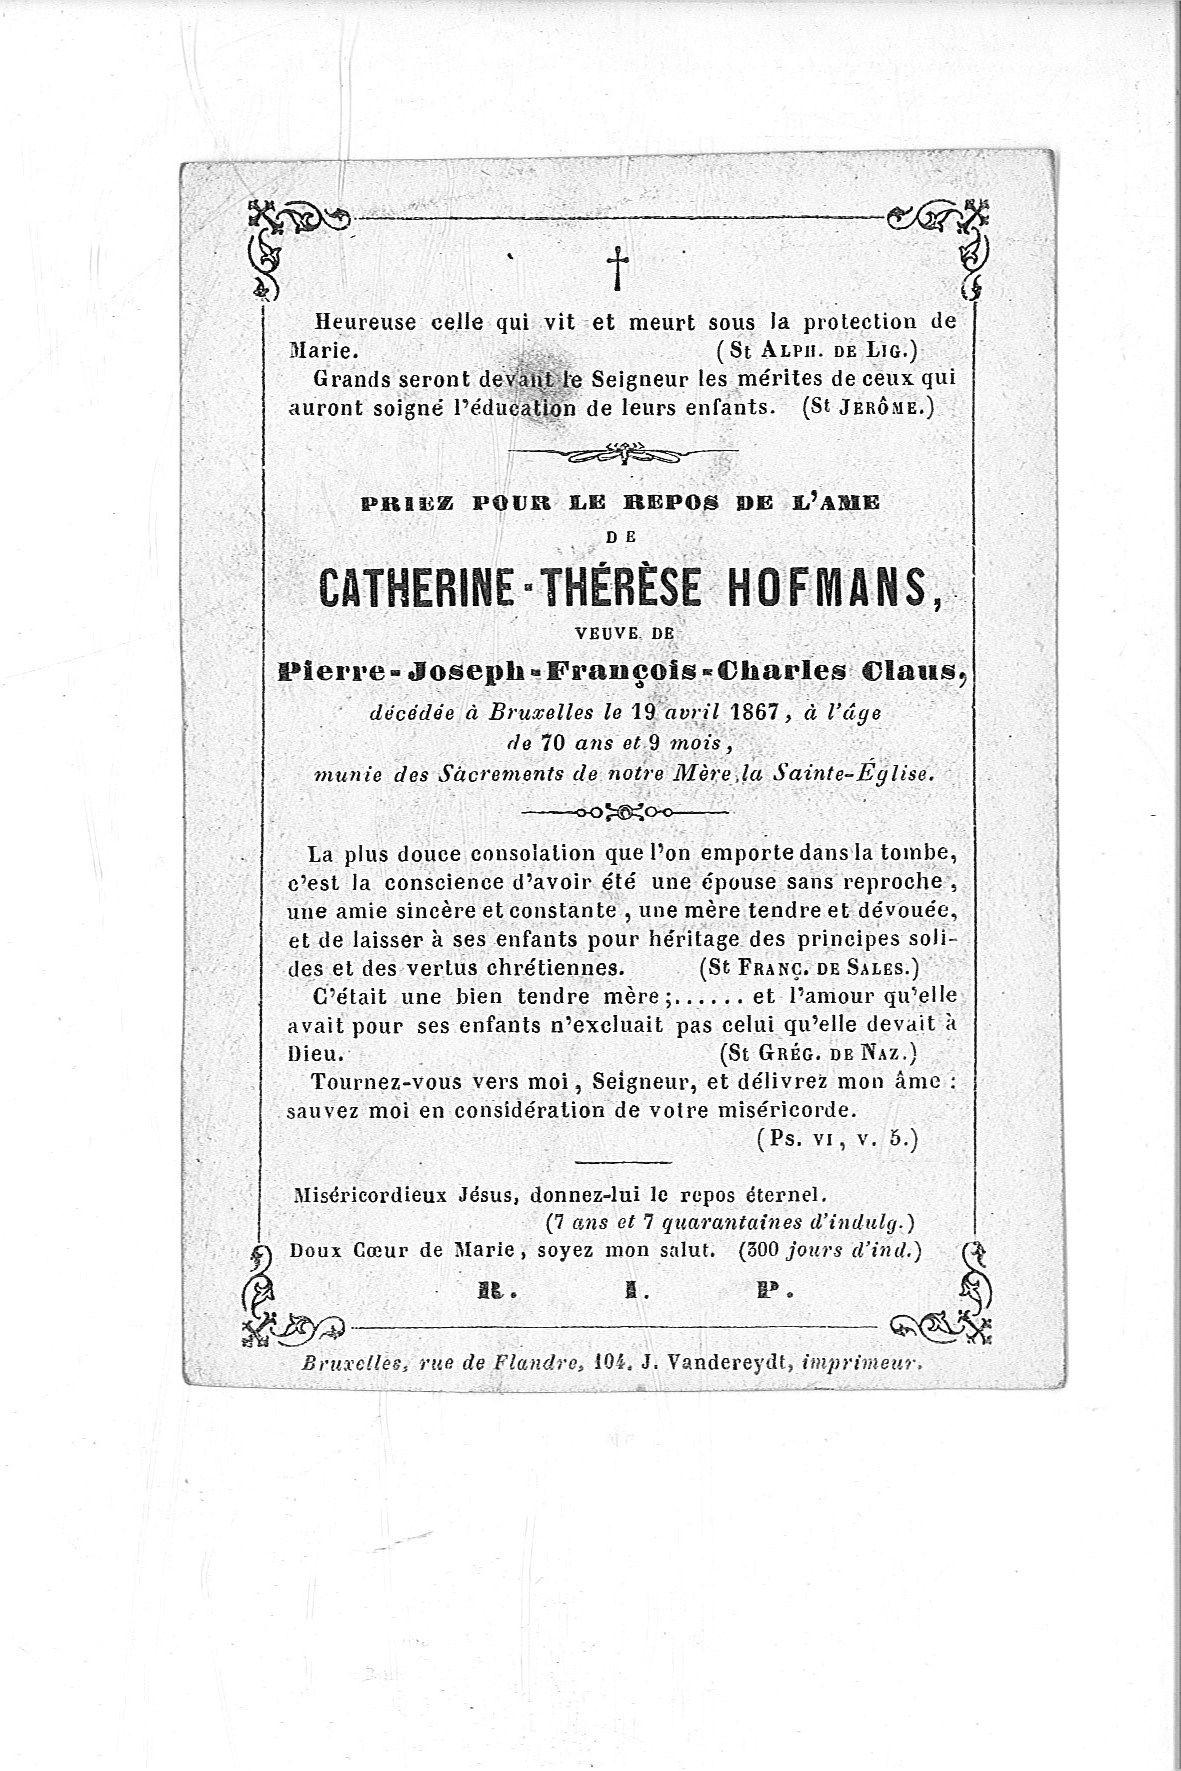 Catherine-Thérèse20090904095259_00021.jpg